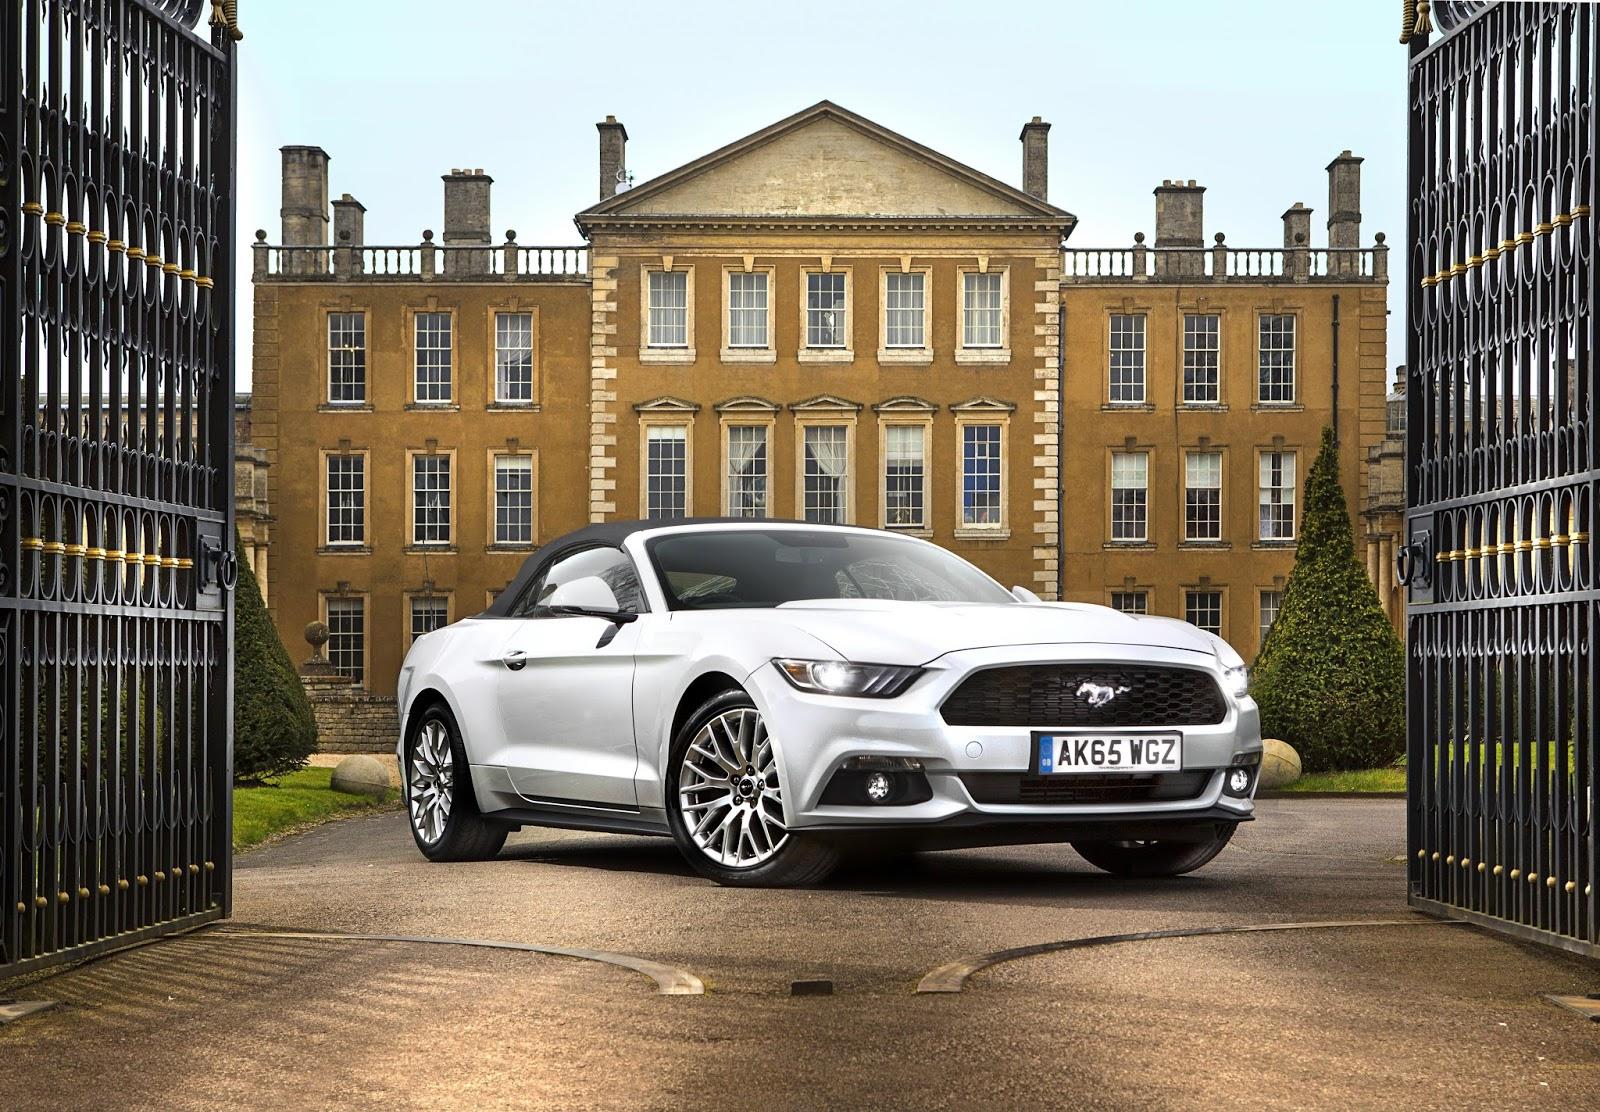 Best SellingSportsCar MustangEngland Ο... τυφώνας Ford Mustang εξαπλώνεται σε όλο τον κόσμο και ξεπουλάει! Bestseller, cabrio, Ford Mustang, Muscle cars, Sales, πωλήσεις, πωλήσεις αυτοκινήτων